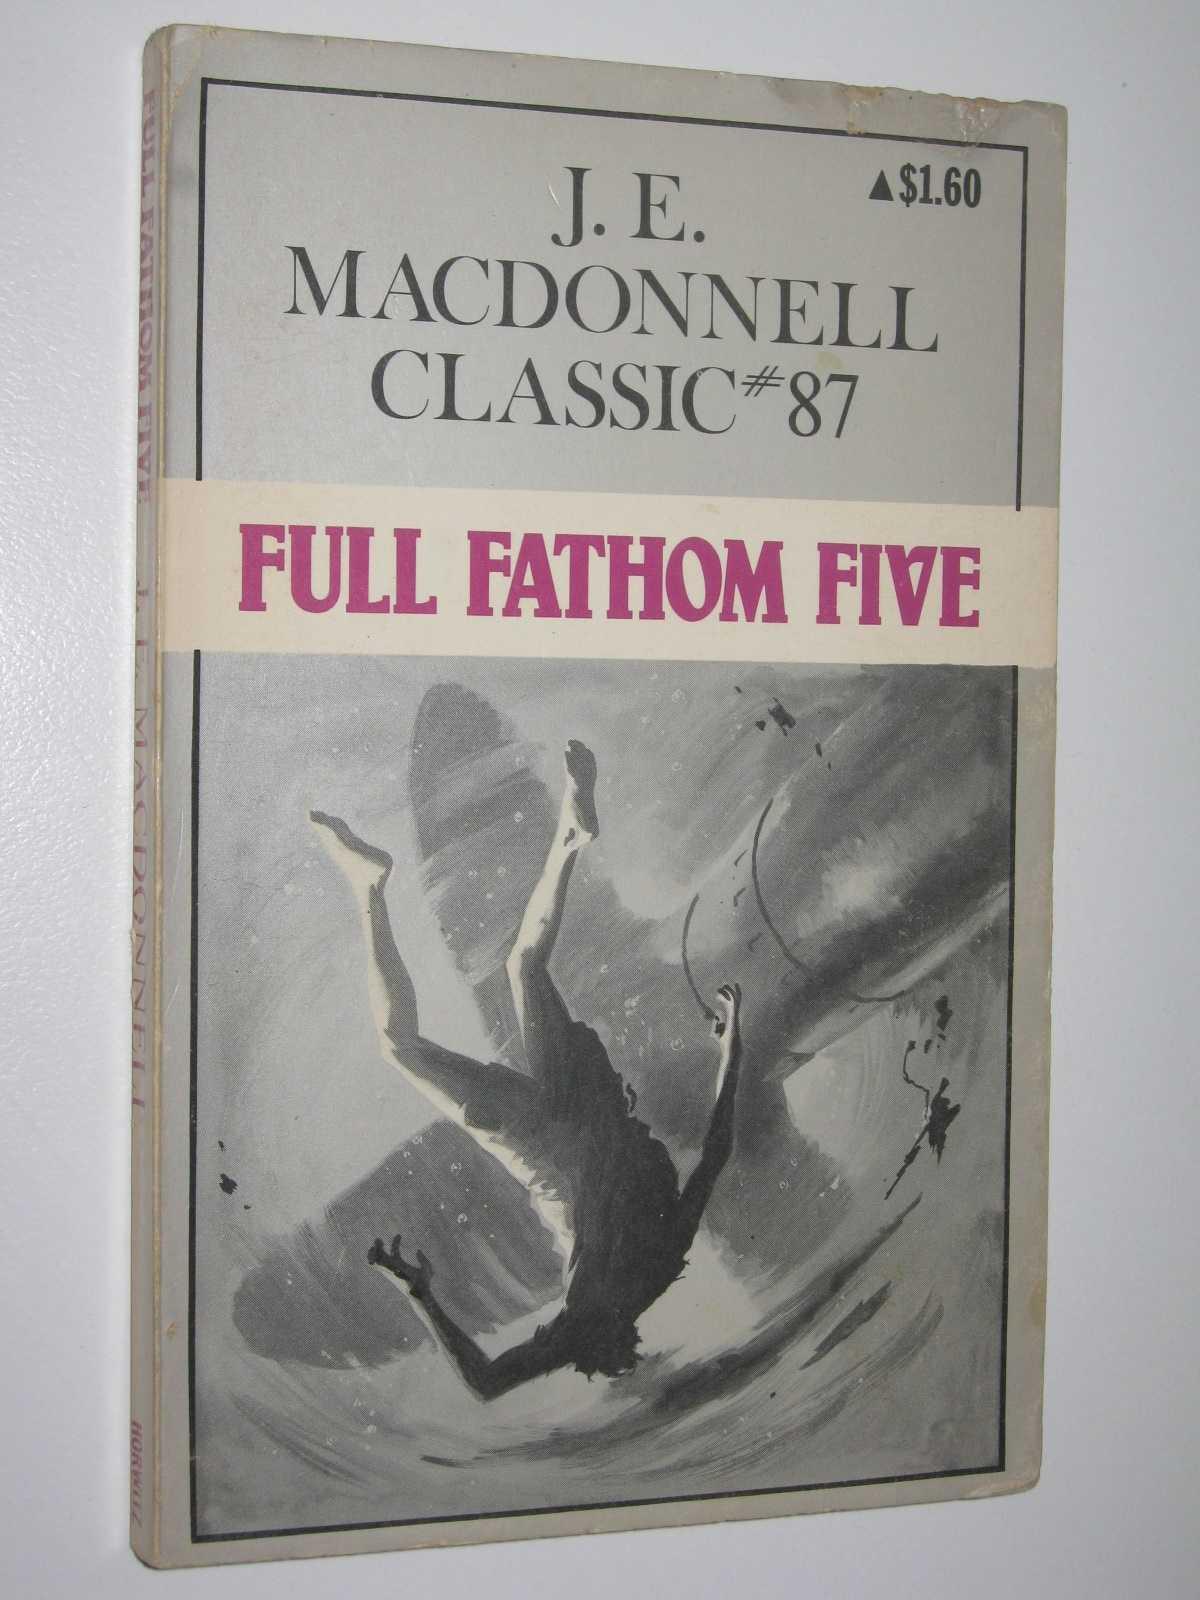 Full Fathom Five - Classic Series #92, Macdonnell, J. E.